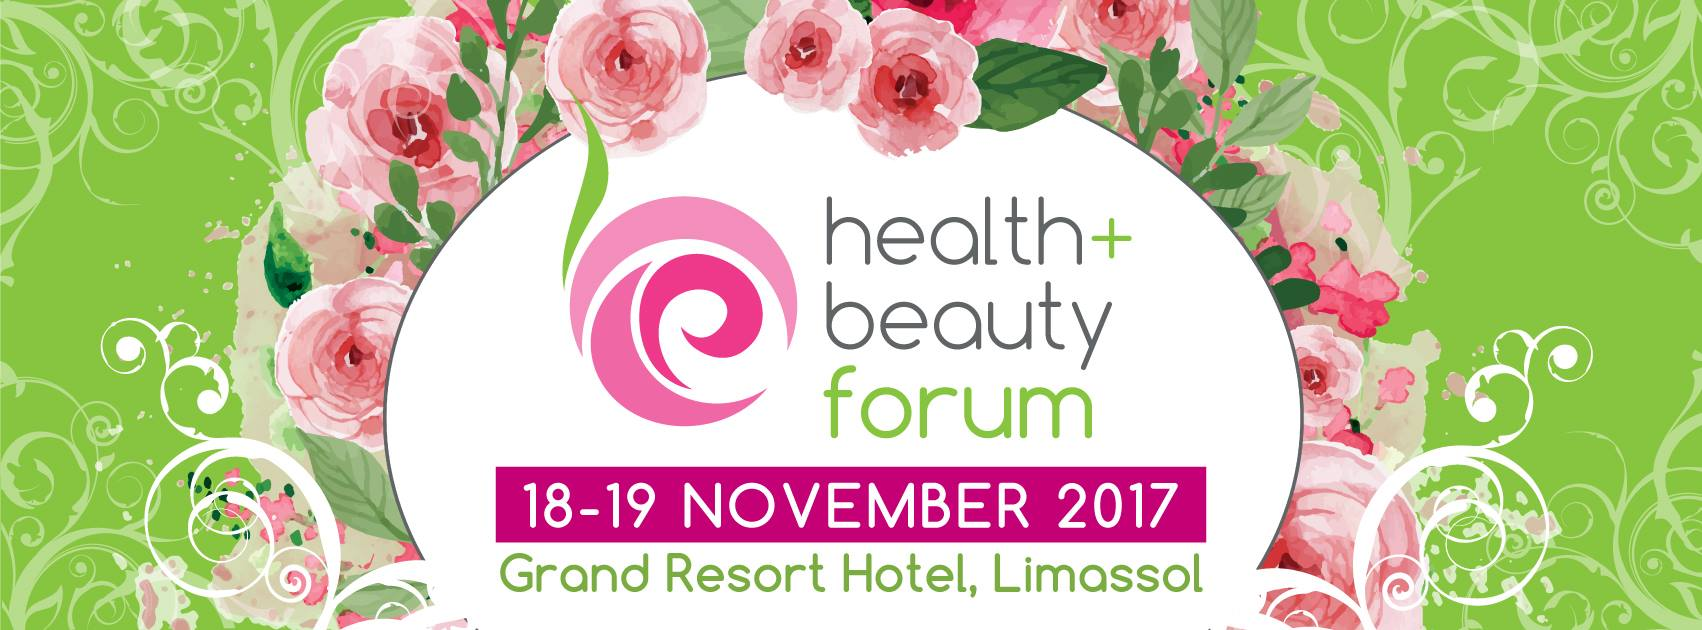 Health & Beauty Expo/Forum